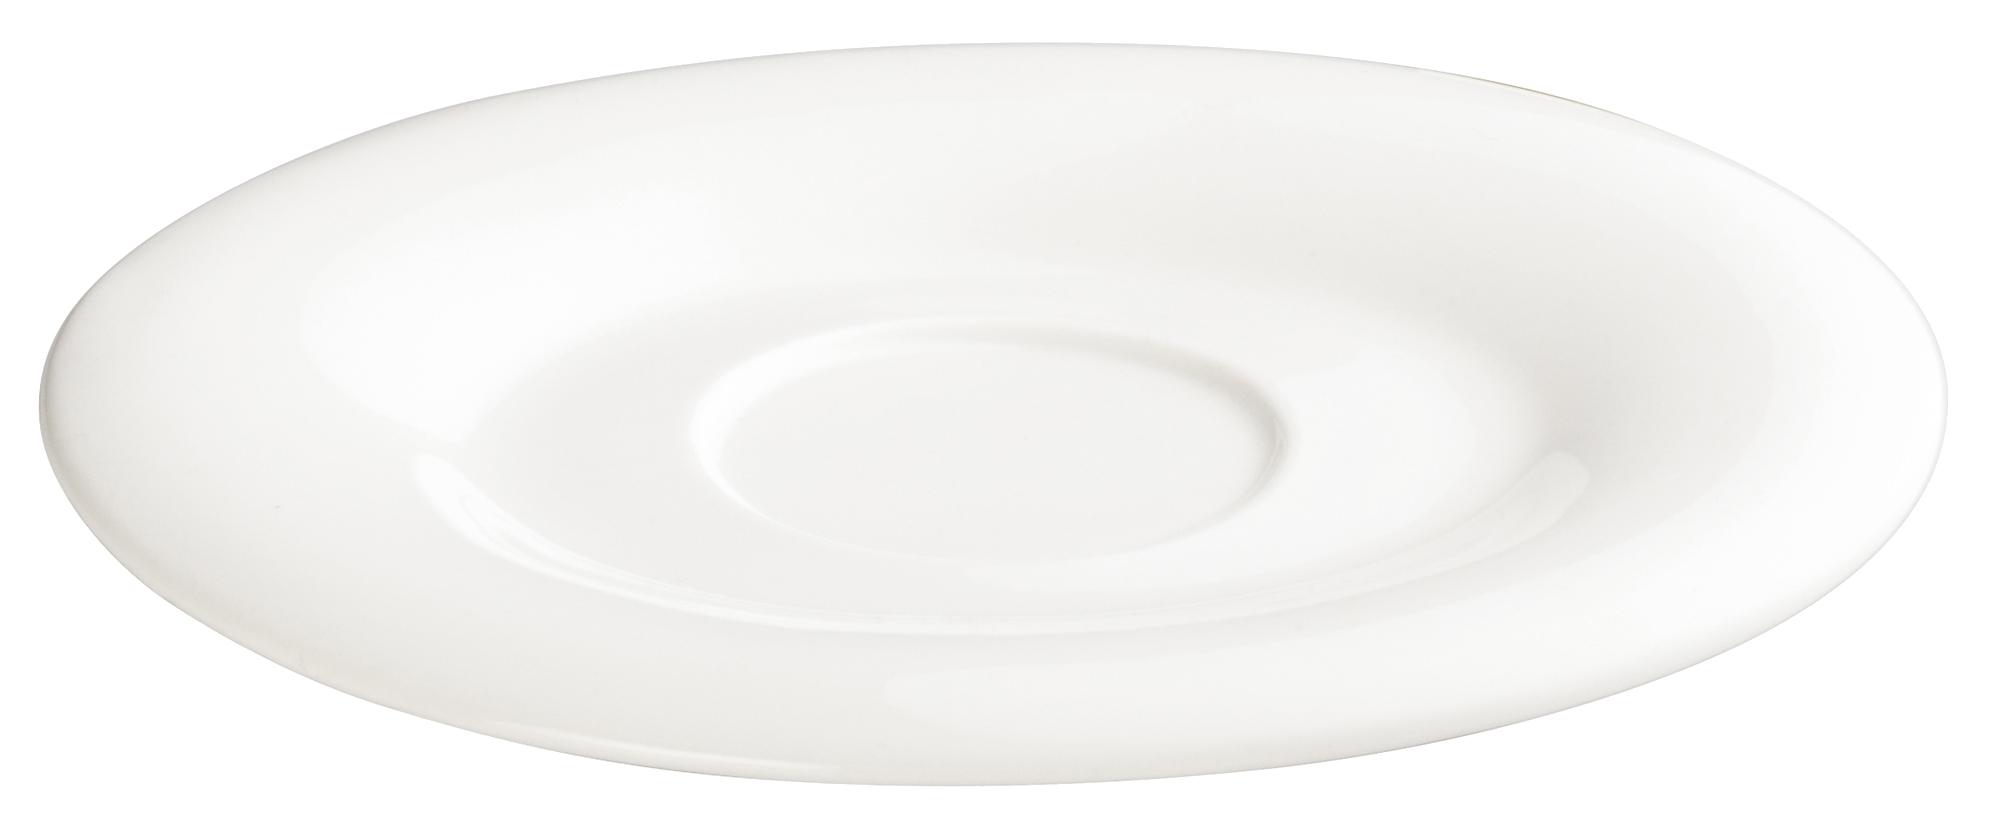 Winco WDP004-215 saucer, china